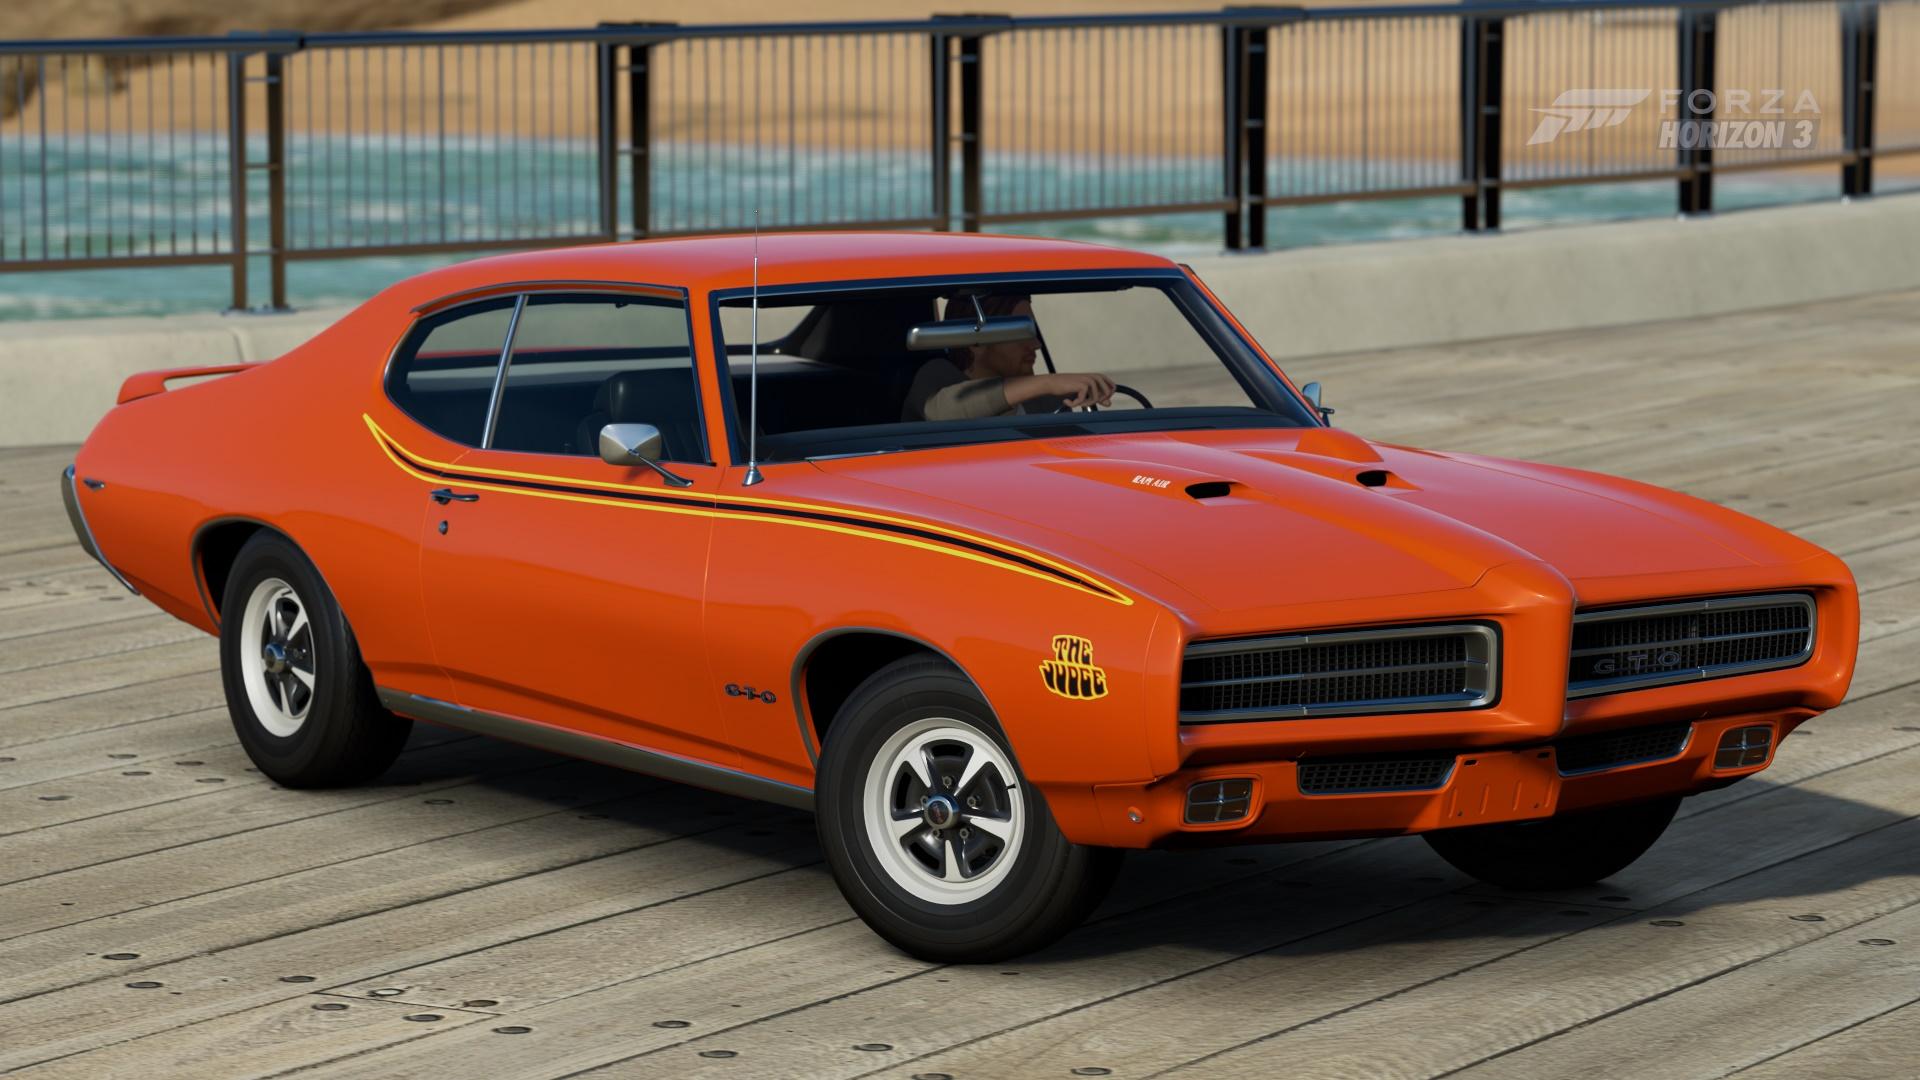 Captivating 1969 Pontiac GTO Judge   Photo By SpeedDemon0388 Design